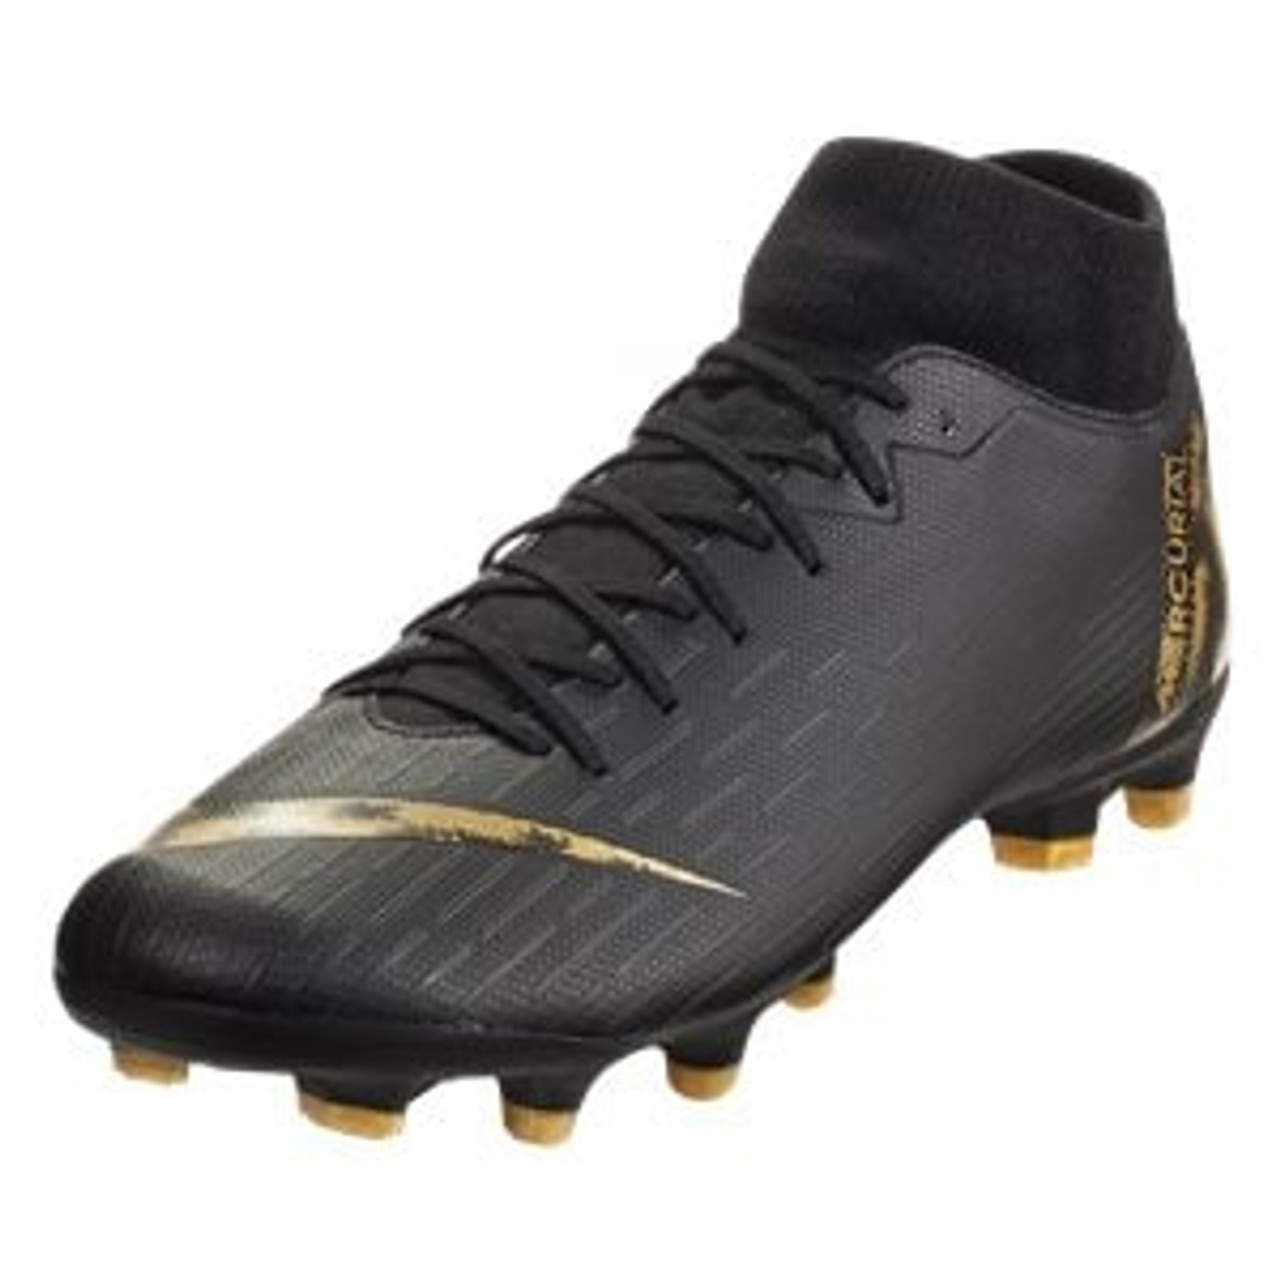 separation shoes bc78b c15e5 NIKE SUPERFLY 6 ACADEMY FG/MG BLACK/GOLD